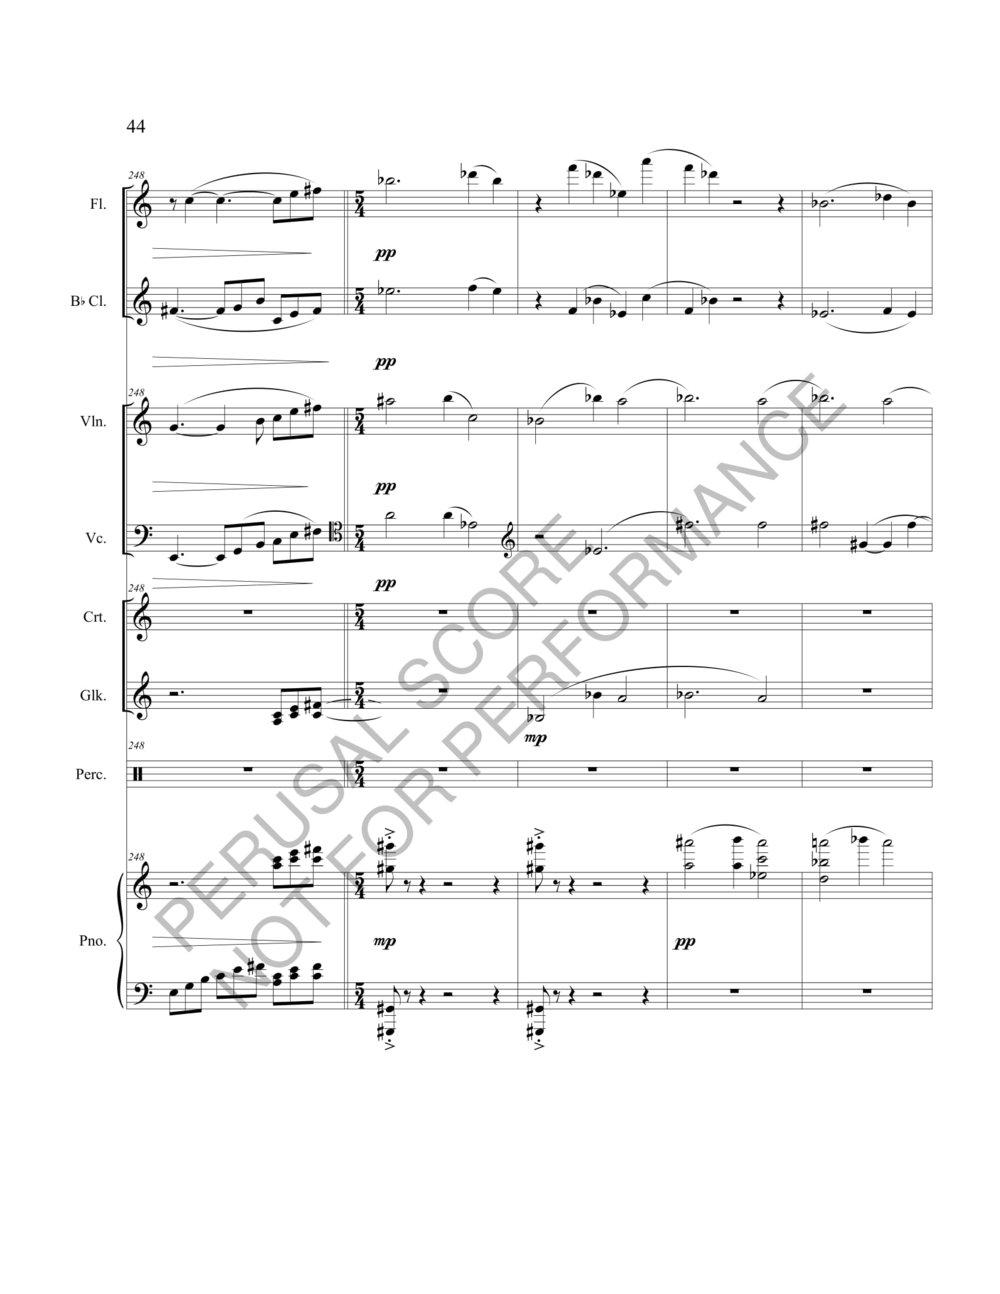 Boyd Terra Liberi Score-watermark-50.jpg